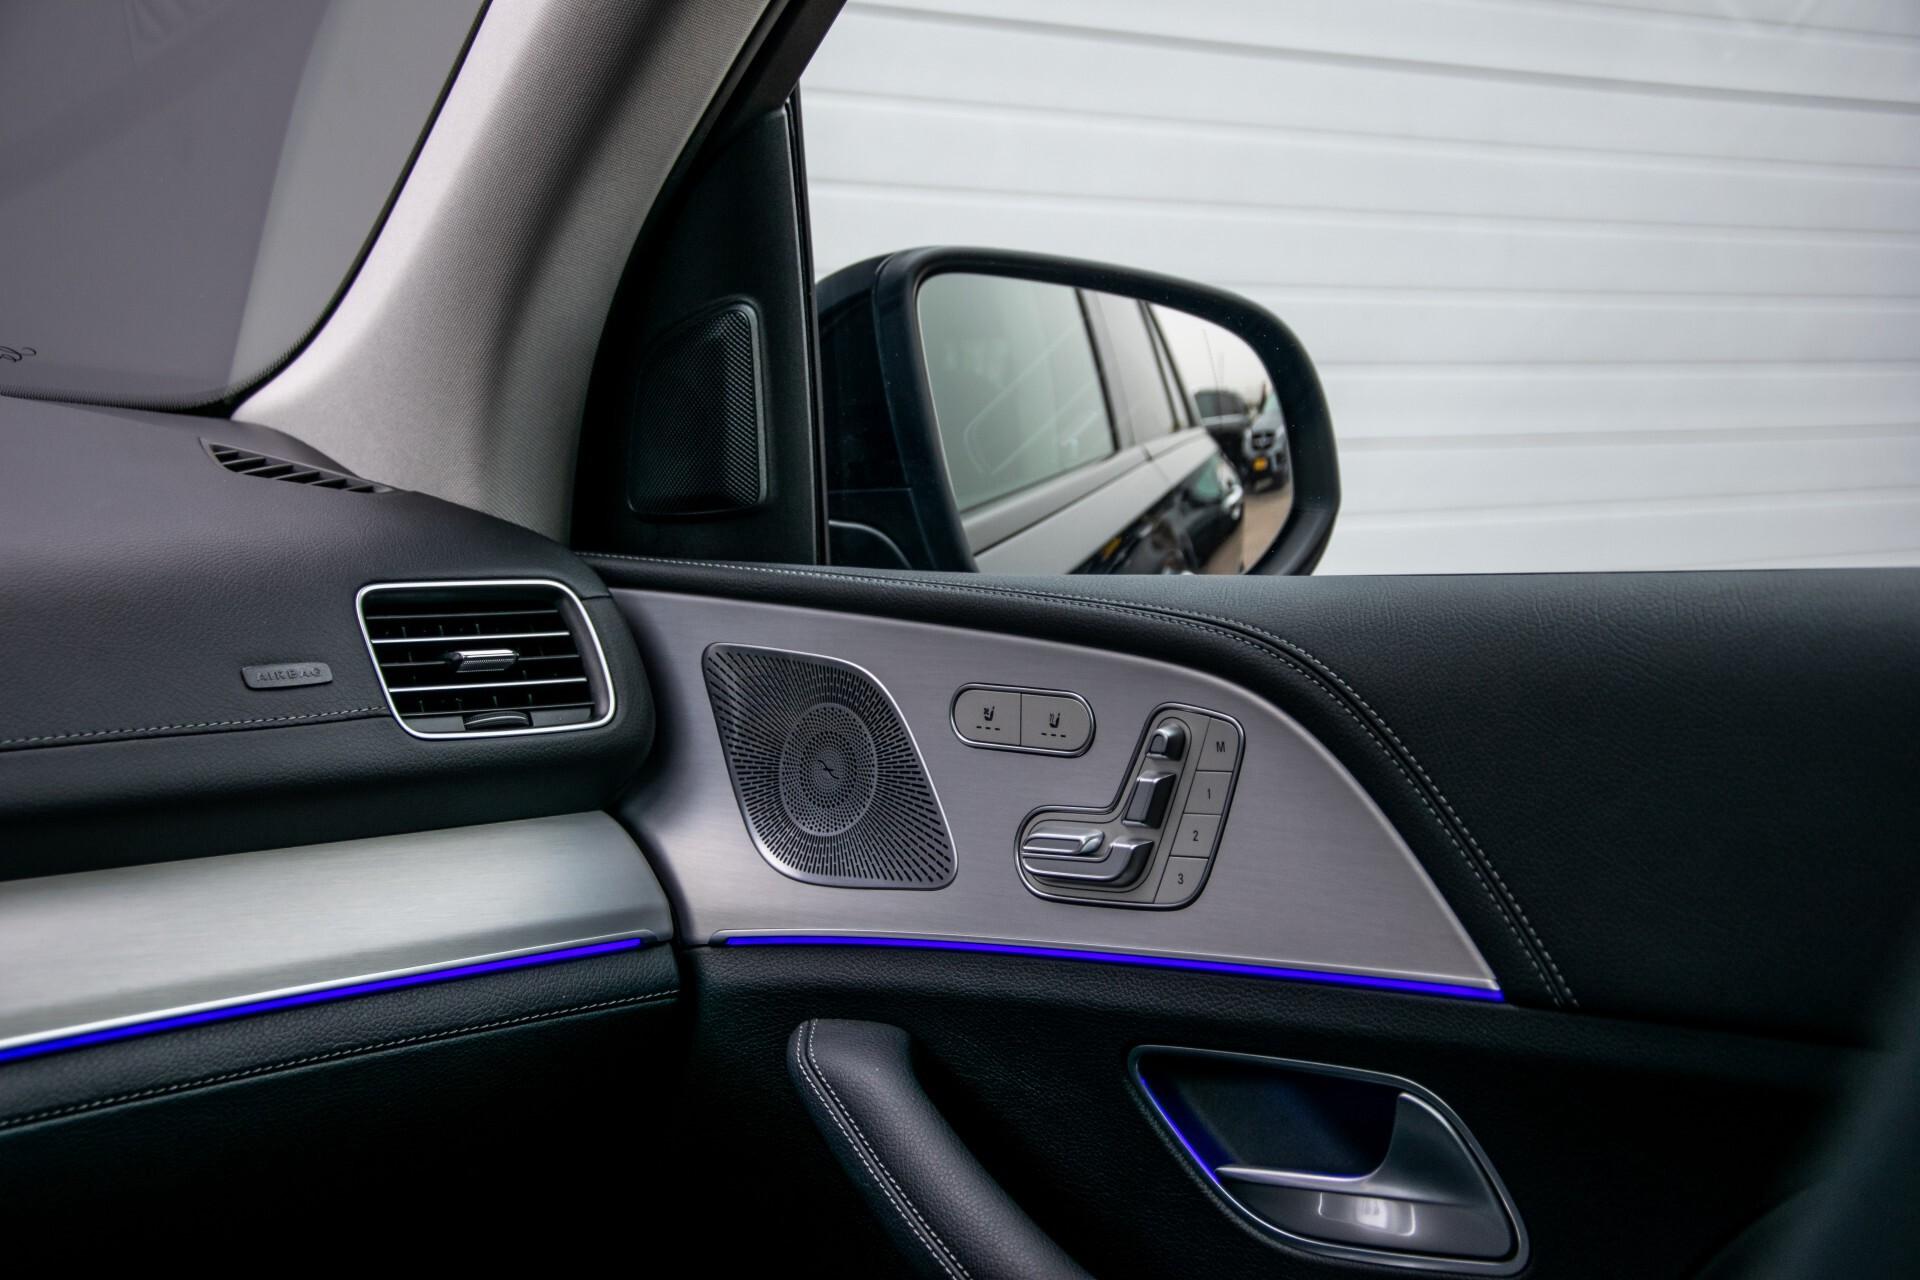 Mercedes-Benz GLE 450 4-M 7-Persoons AMG Massage/Rij-assist/Keyless/TV/360/Night/Trekhaak Aut9 Foto 41